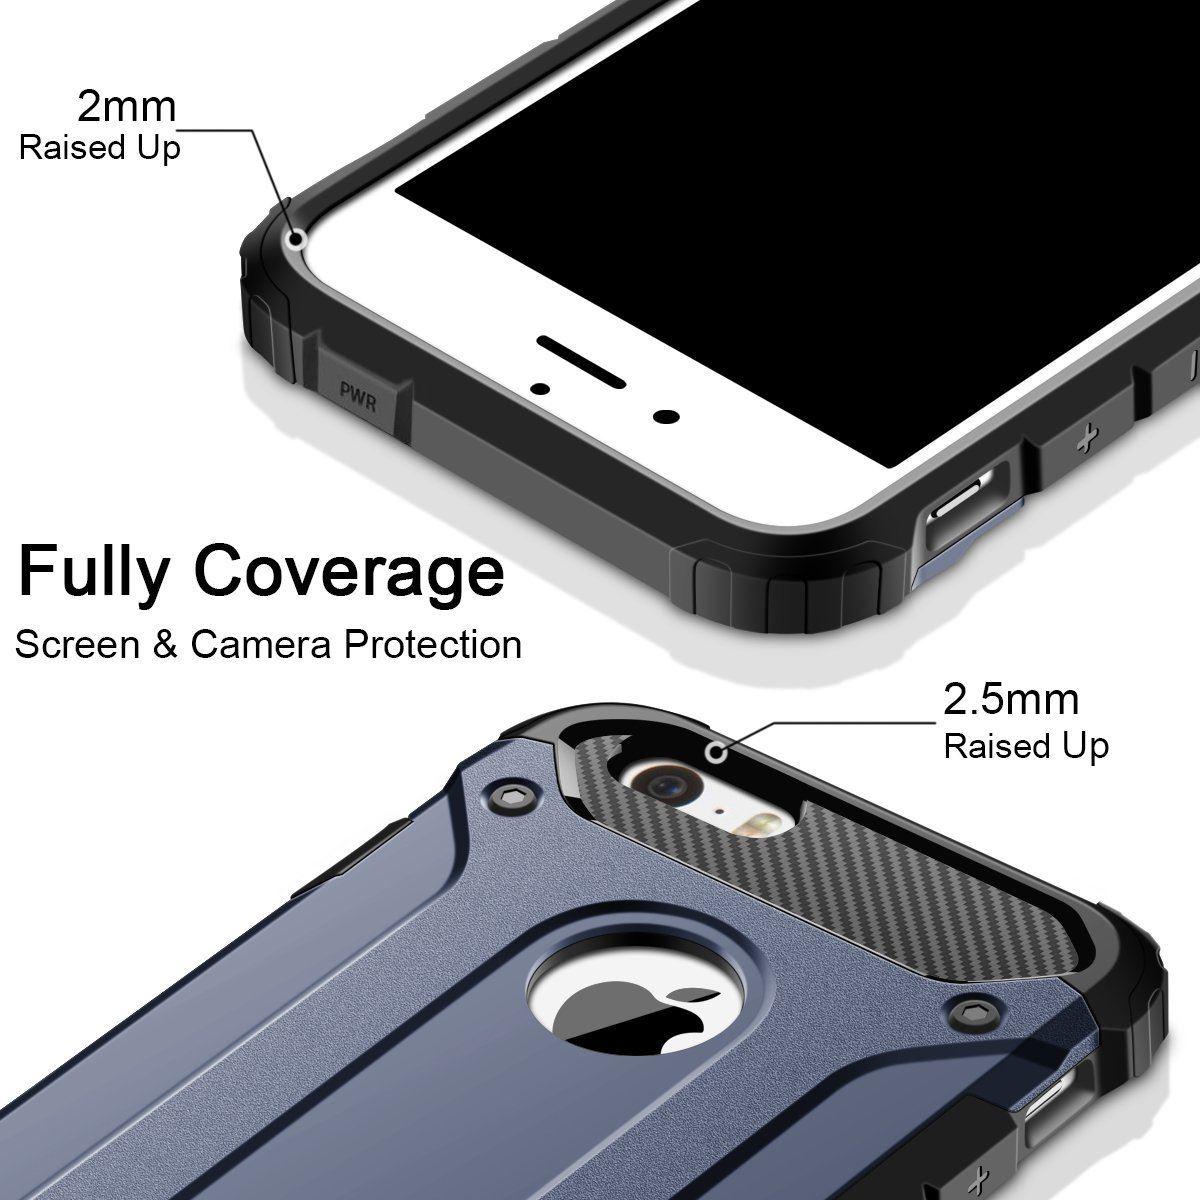 thumbnail 32 - For Apple iPhone 11 Pro Max XR Xs X 8 7 Plus 6 5 Se Case Cover Impact Heavy Duty